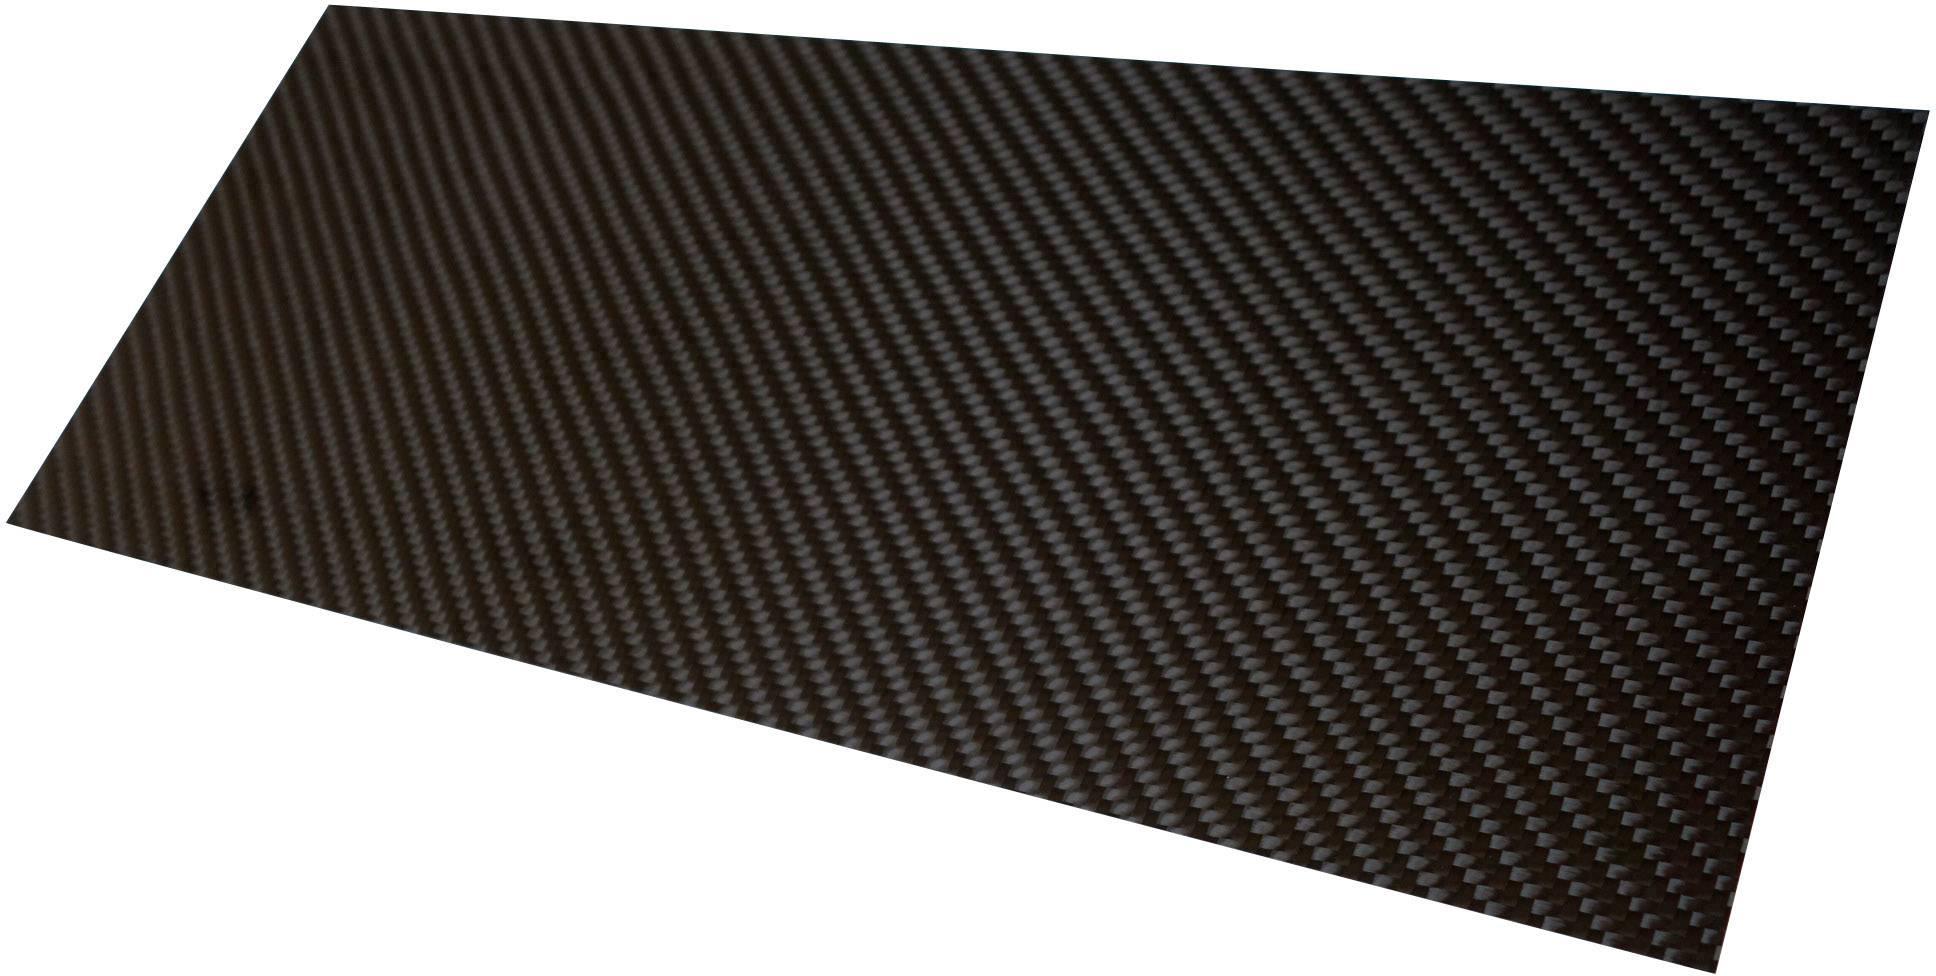 Doska z karbónových vlákien Carbotec CFK-PLATTE 3MM, (d x š) 350 mm x 150 mm x 3 mm